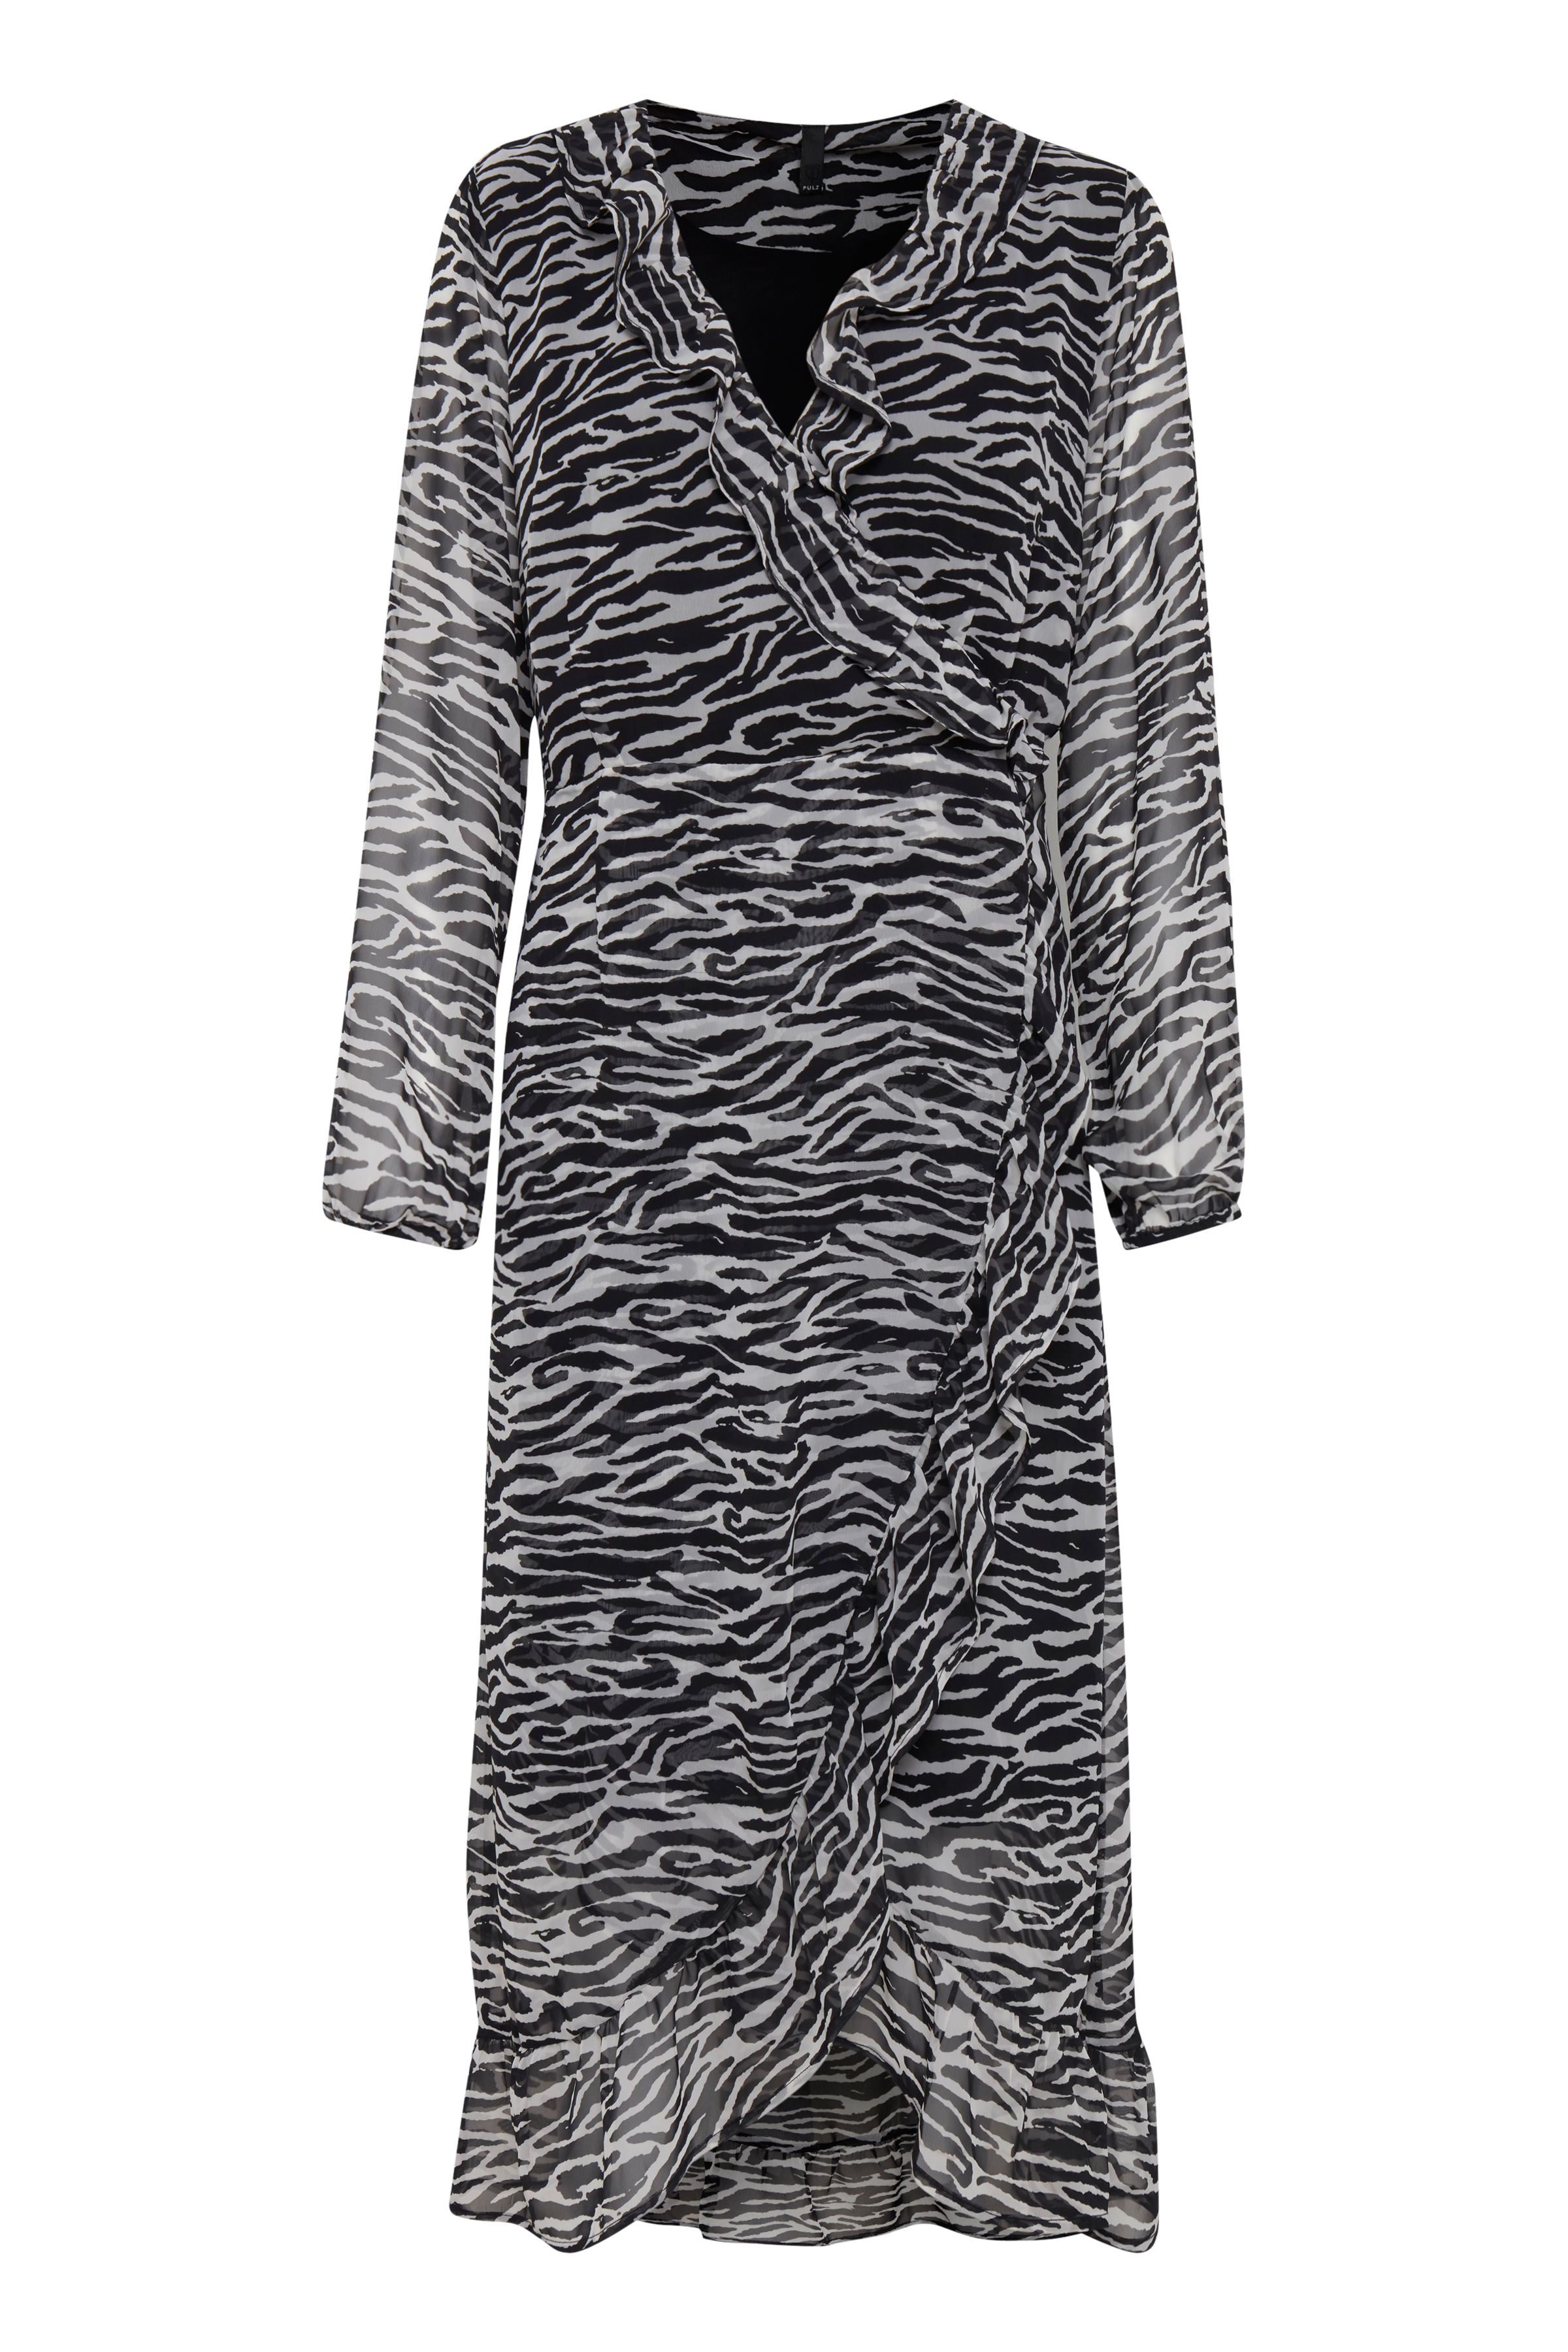 Pulz Jeans Dame Letvævet kjole - Black